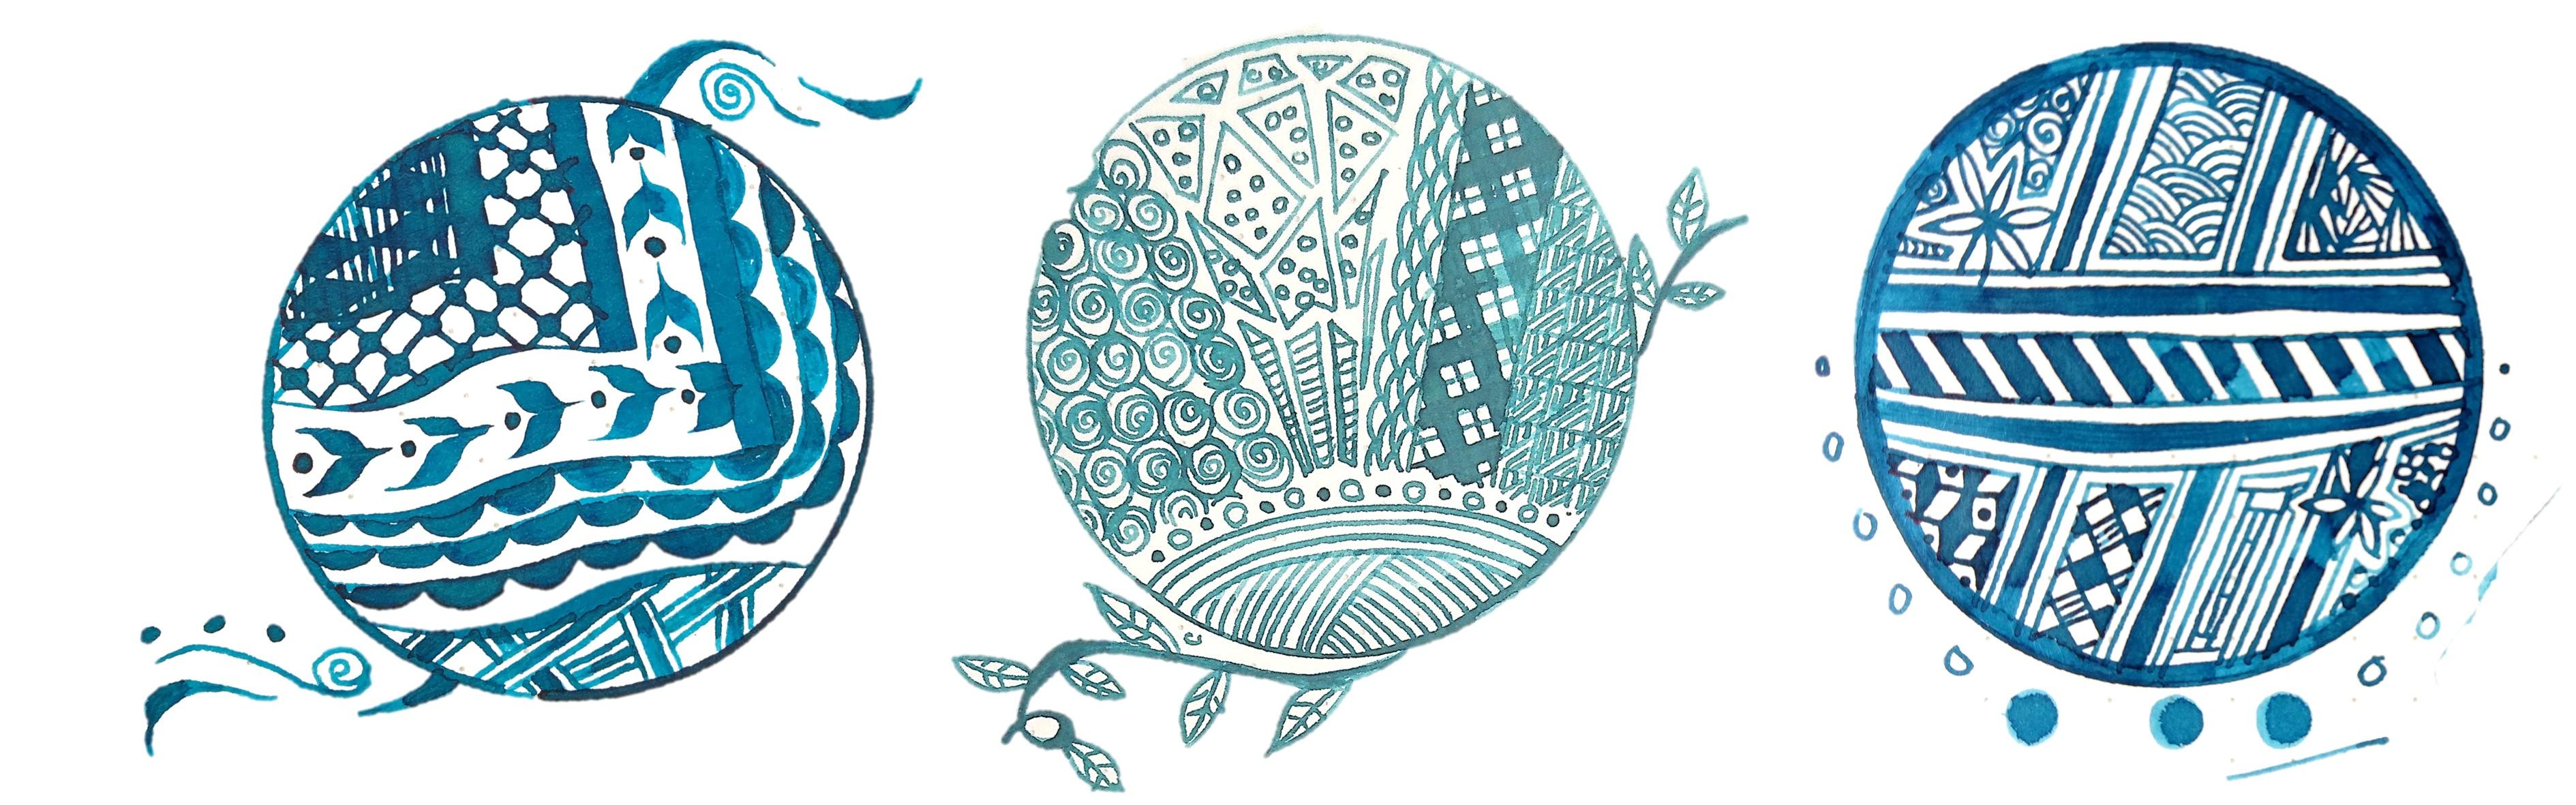 Robert Oster Signature® - 藍綠色系 Teals